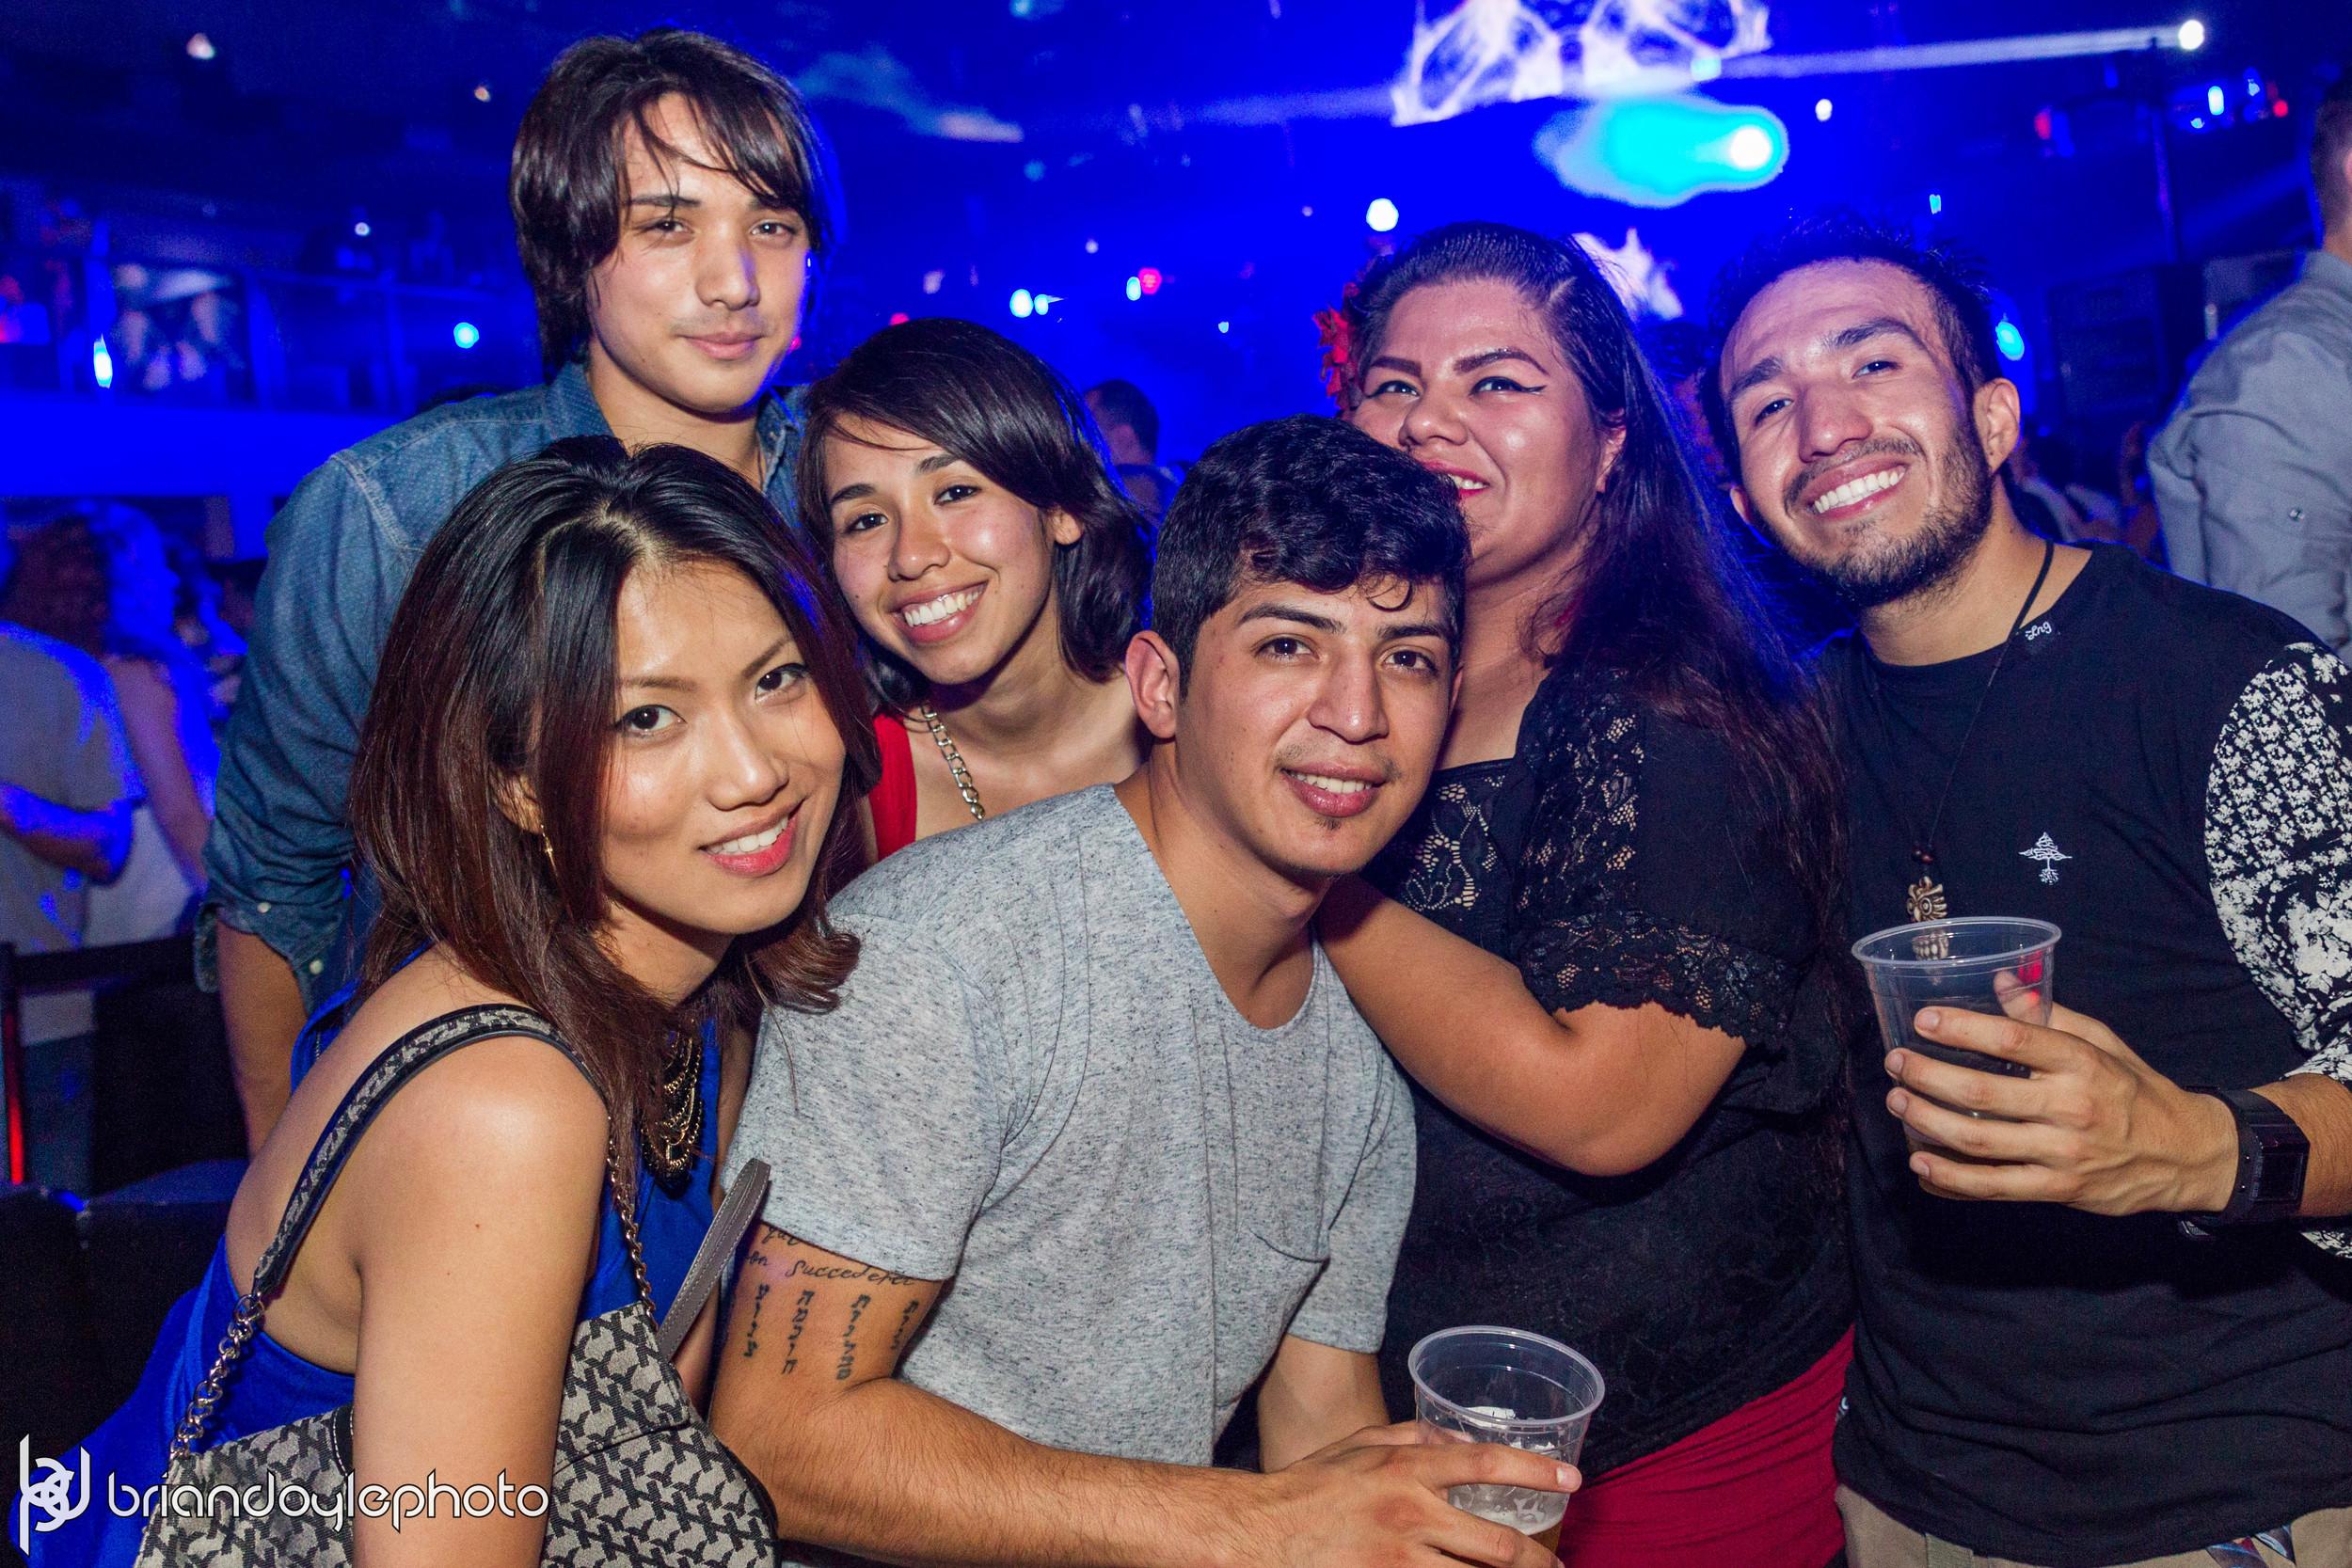 Riva Star, Dirty Bird, Shmitty b2b  leiel at Exchange LA 03.28.2015 (30 of 38).jpg